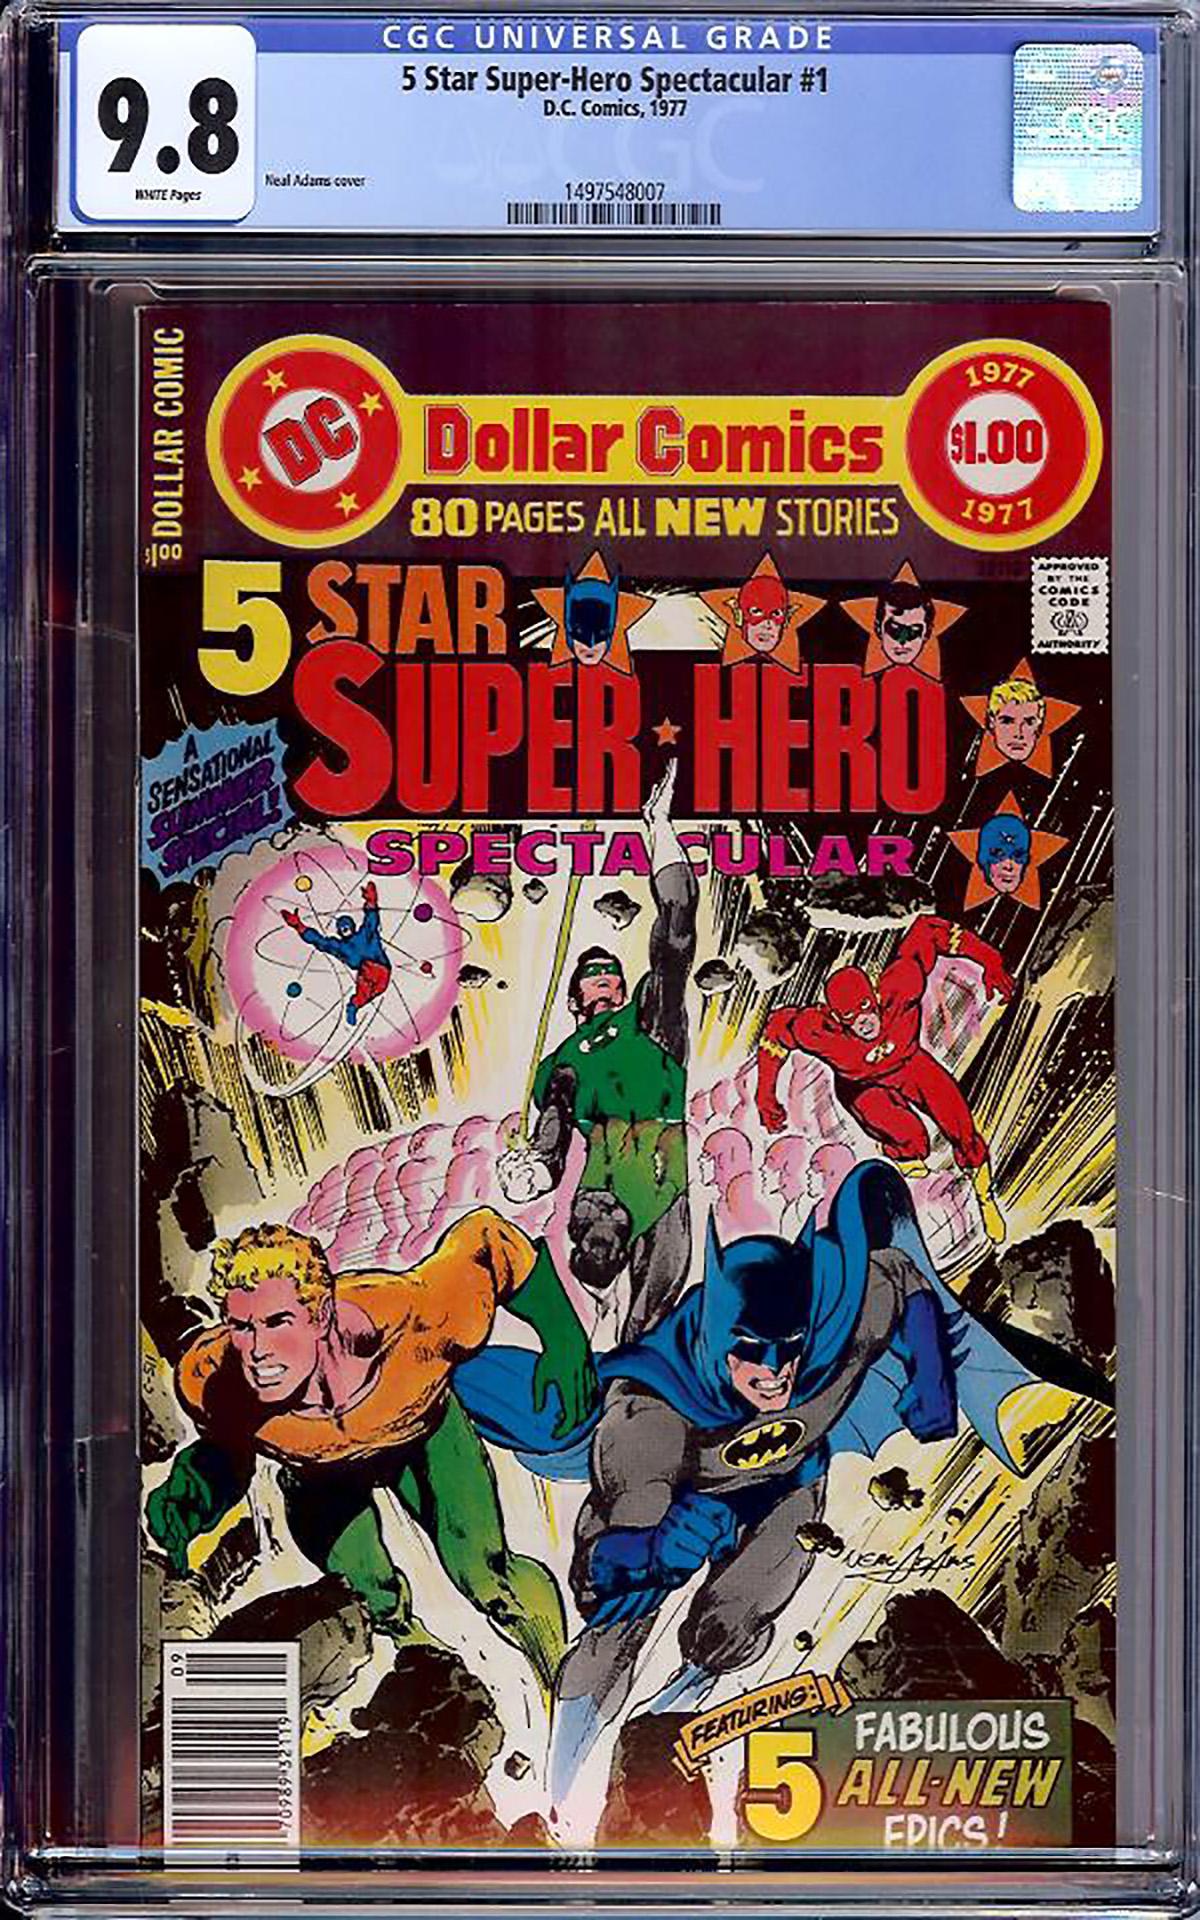 5 Star Super-Hero Spectacular #1 CGC 9.8 w